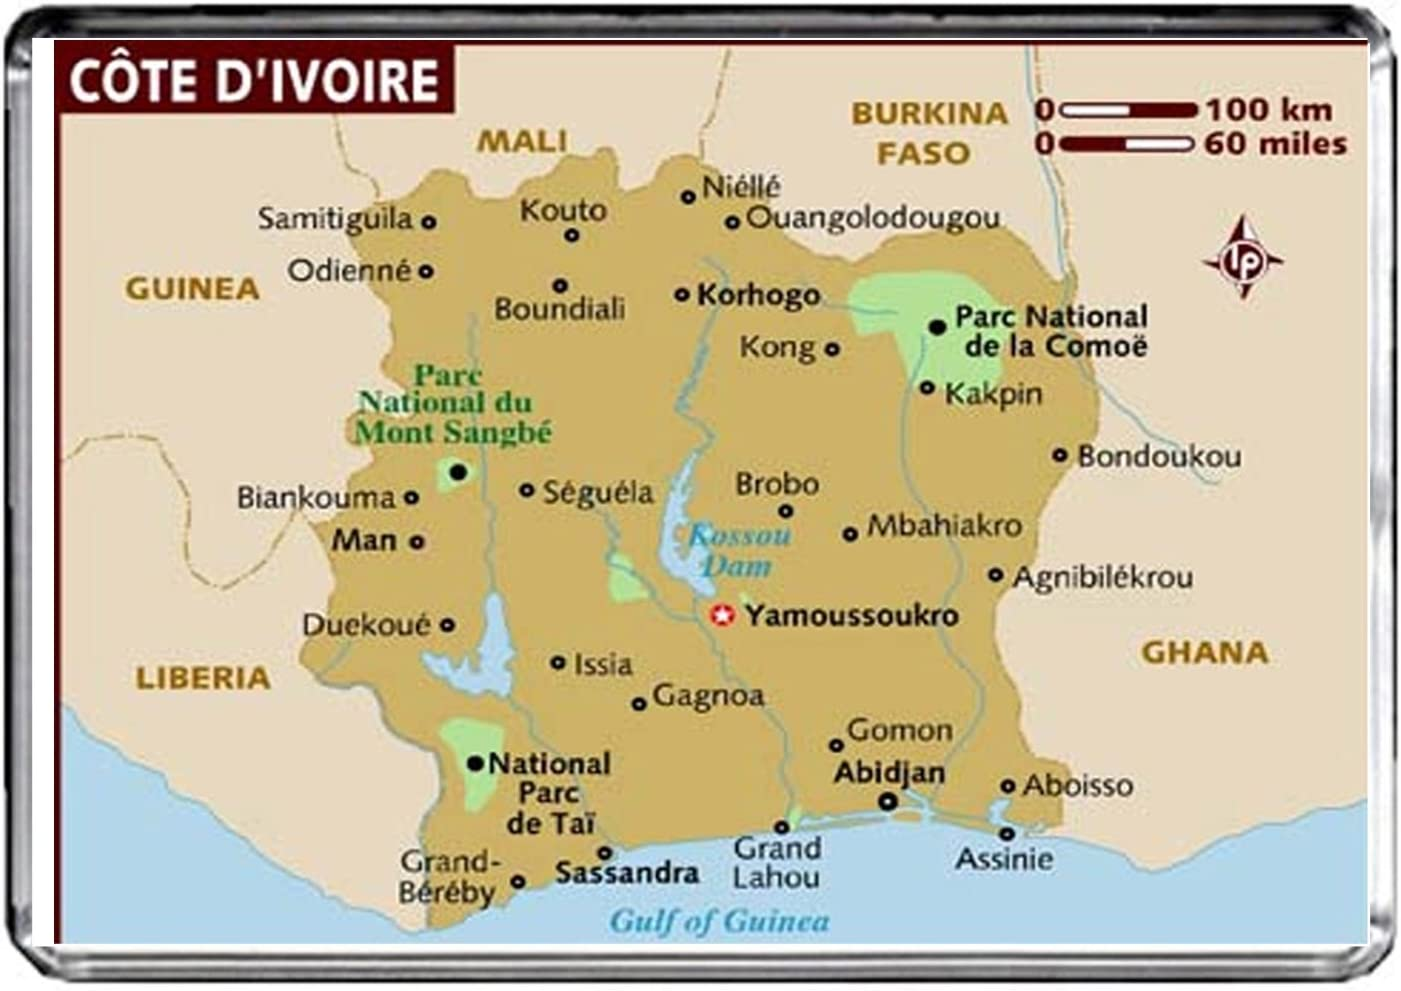 M049 Karte Von Cote D Ivoire Kuhlschrankmagnet Cote D Ivoire Reise Kuhlschrankmagnet Amazon De Kuche Haushalt